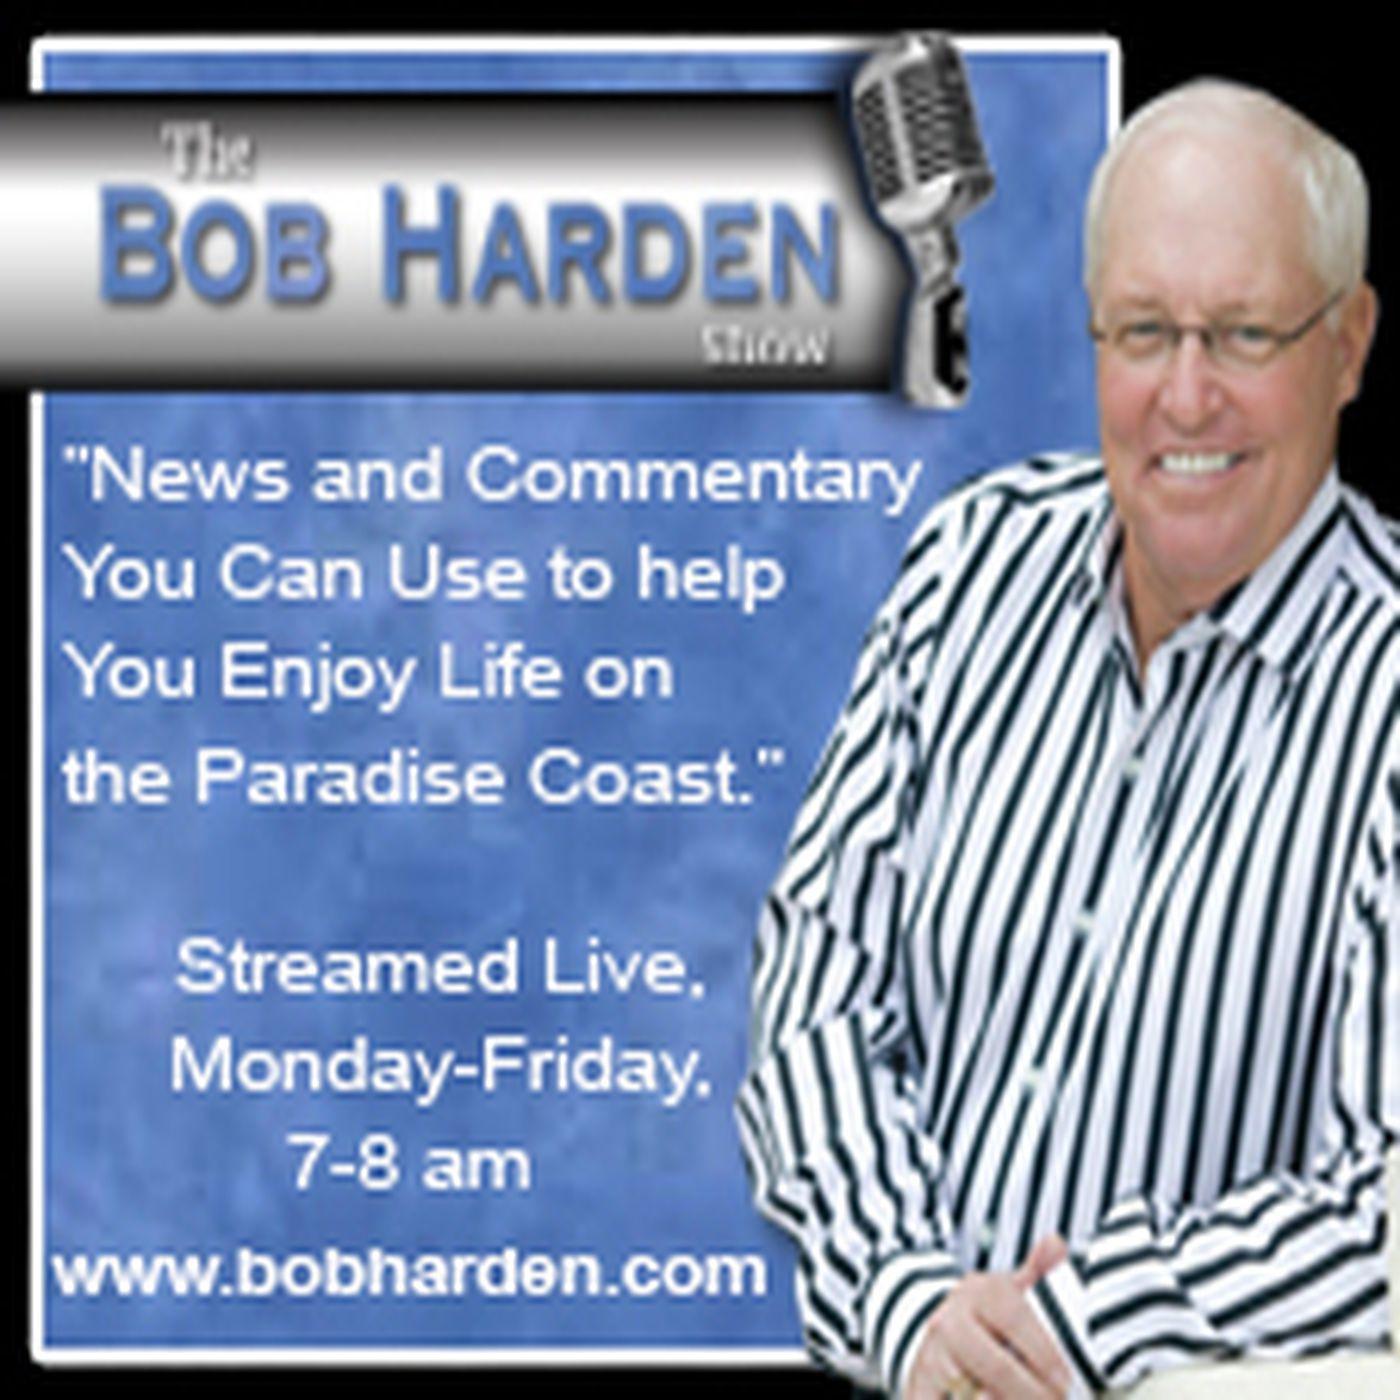 The Bob Harden Show